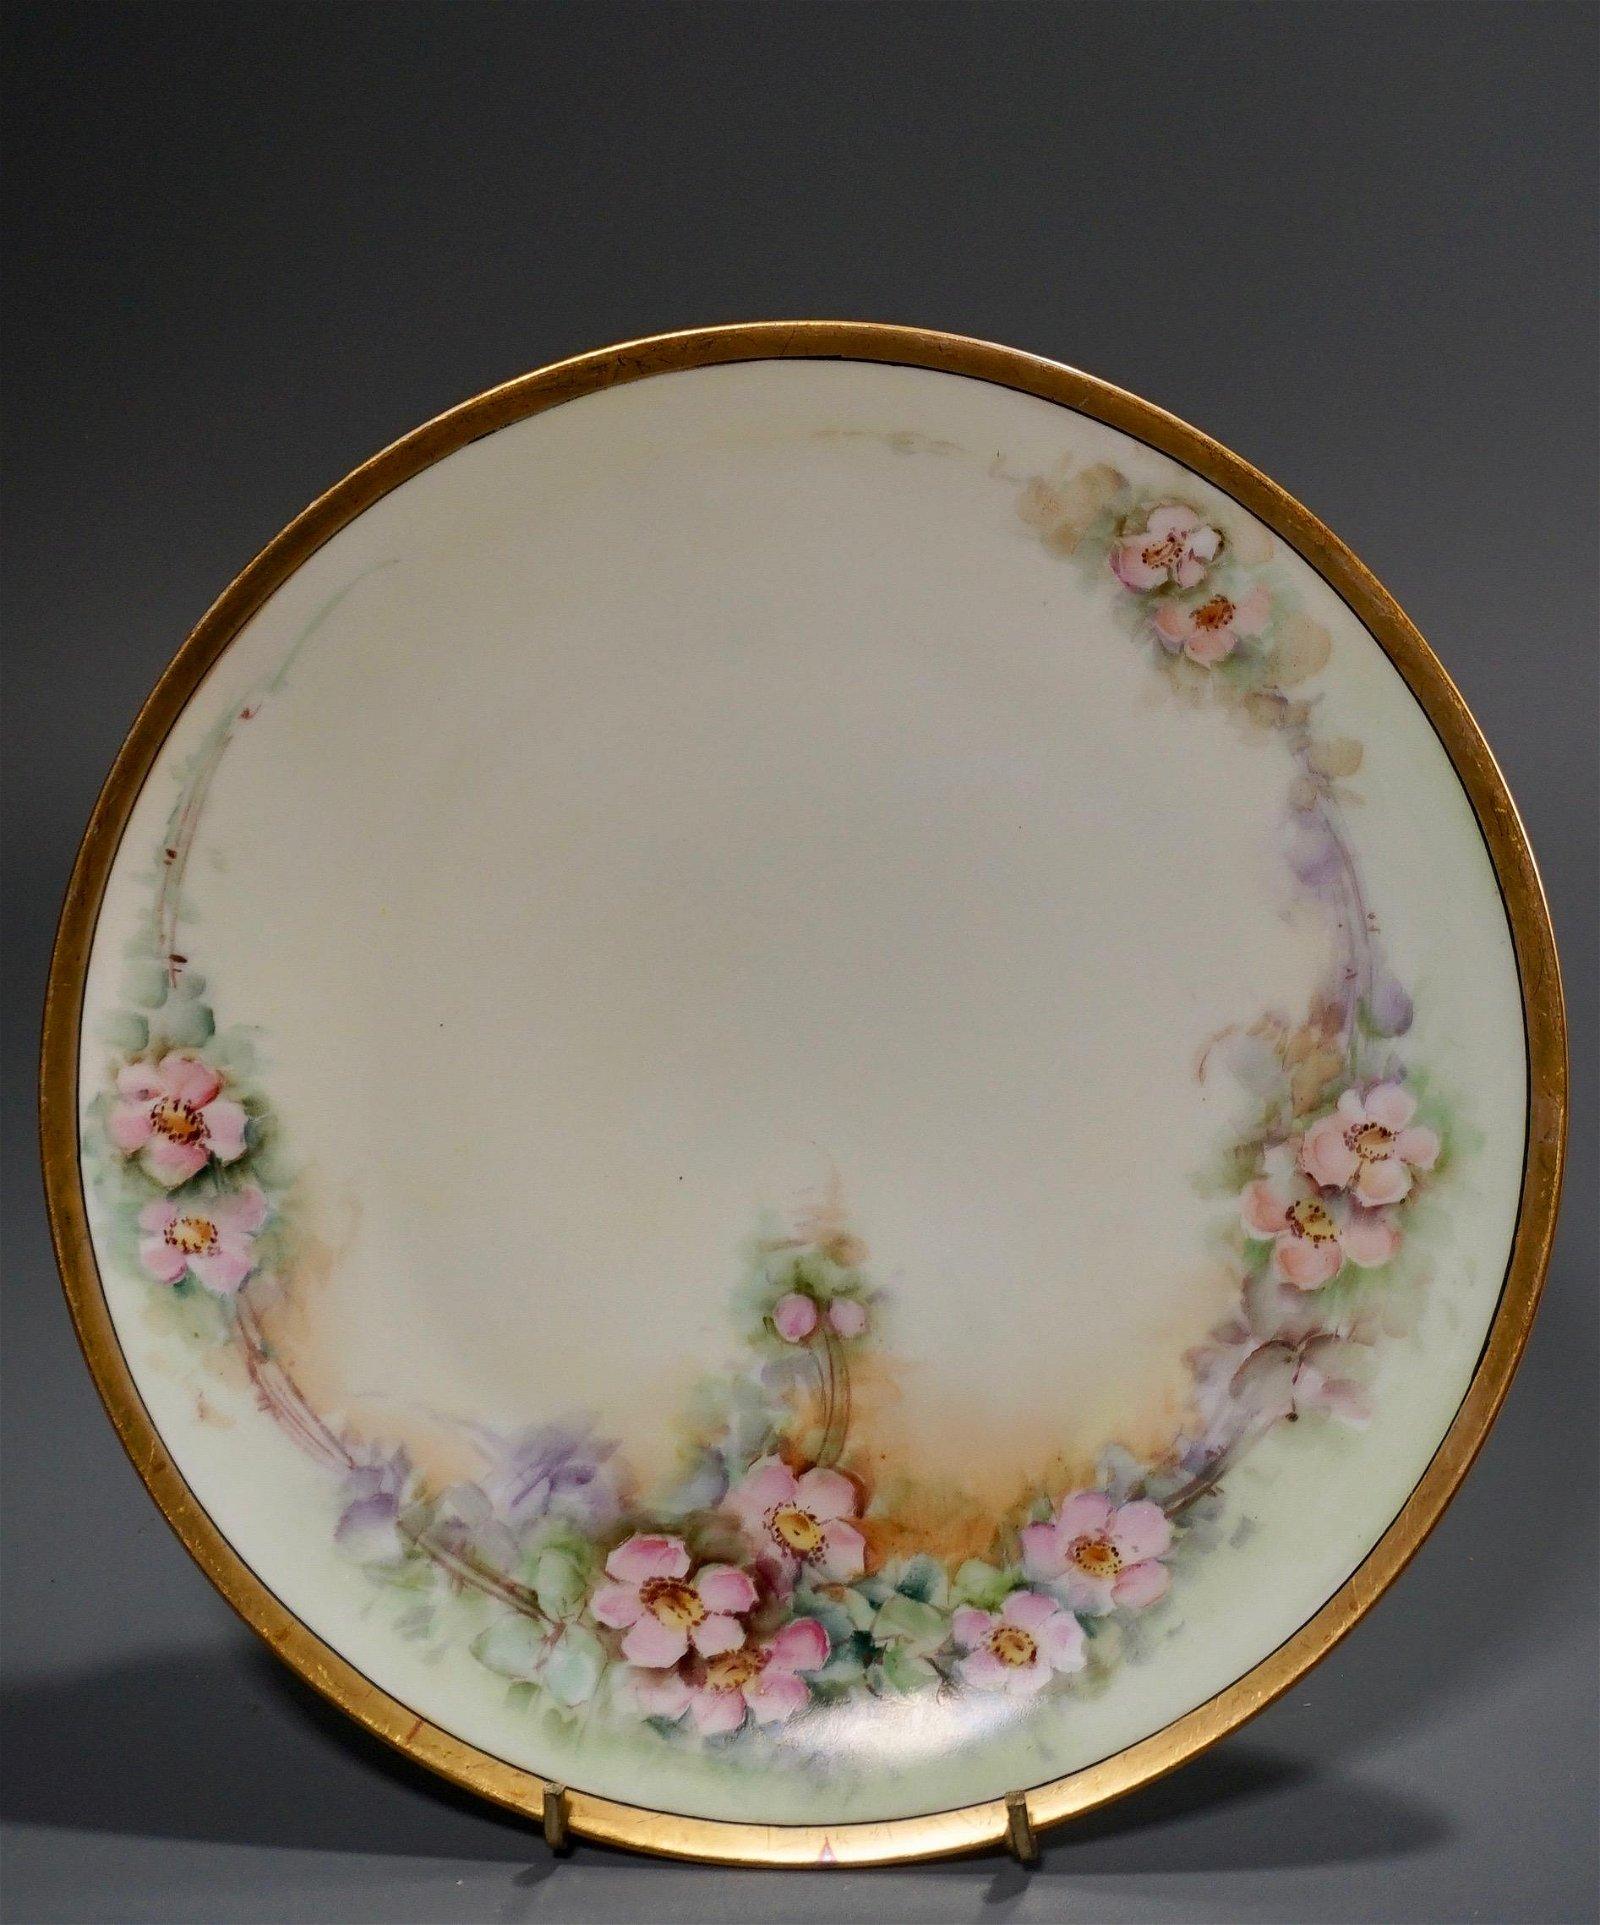 Thomas Sevres Bavaria Hand Painted Porcelain Platter